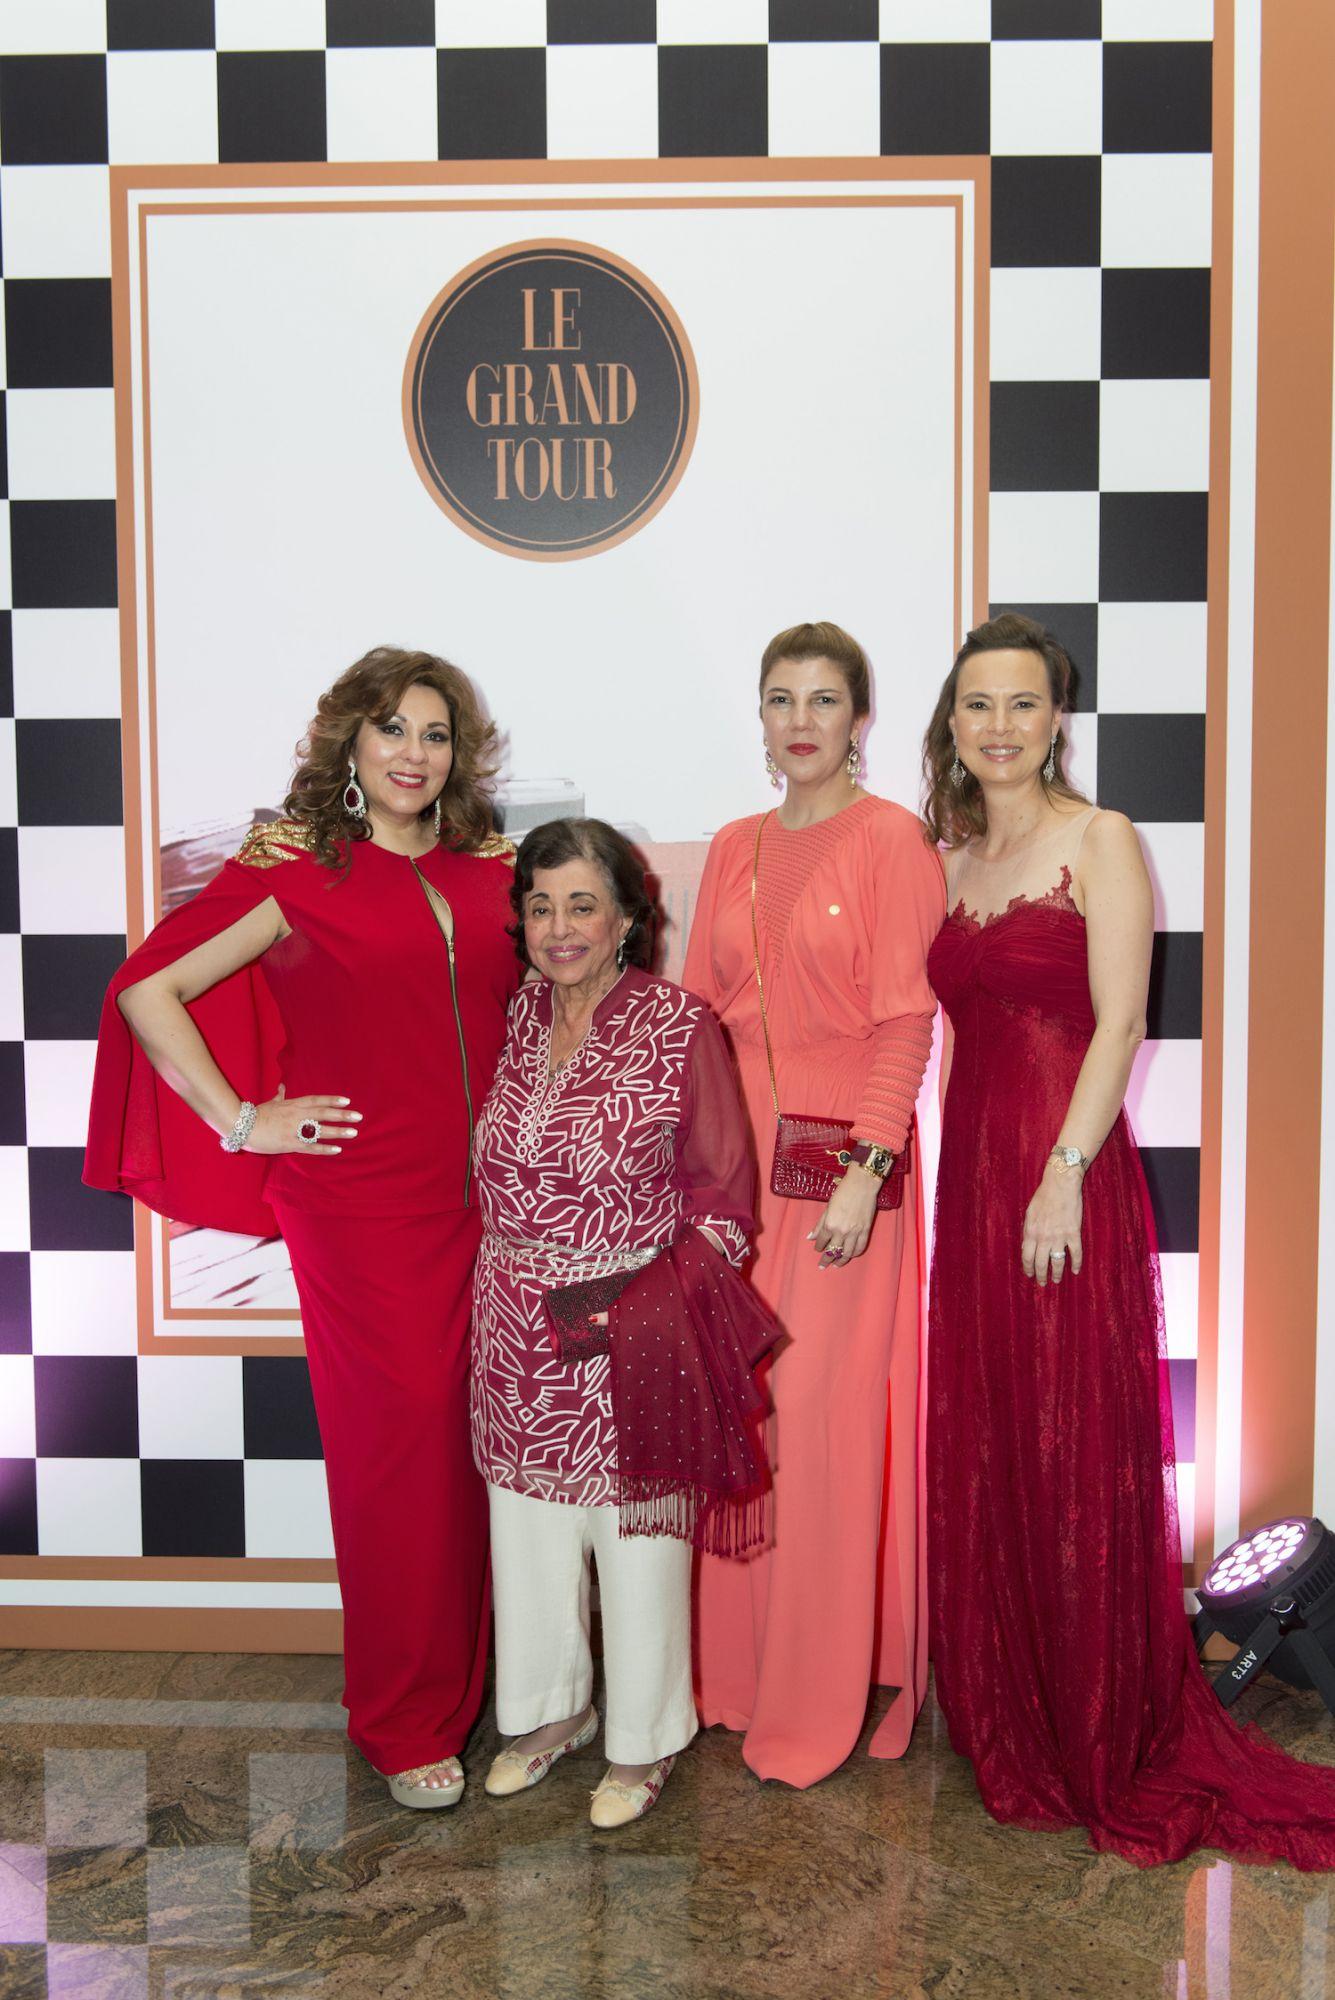 Rina Wadhwani, Purviz Shroff, Janana Suleymanl and Joanna Hotung